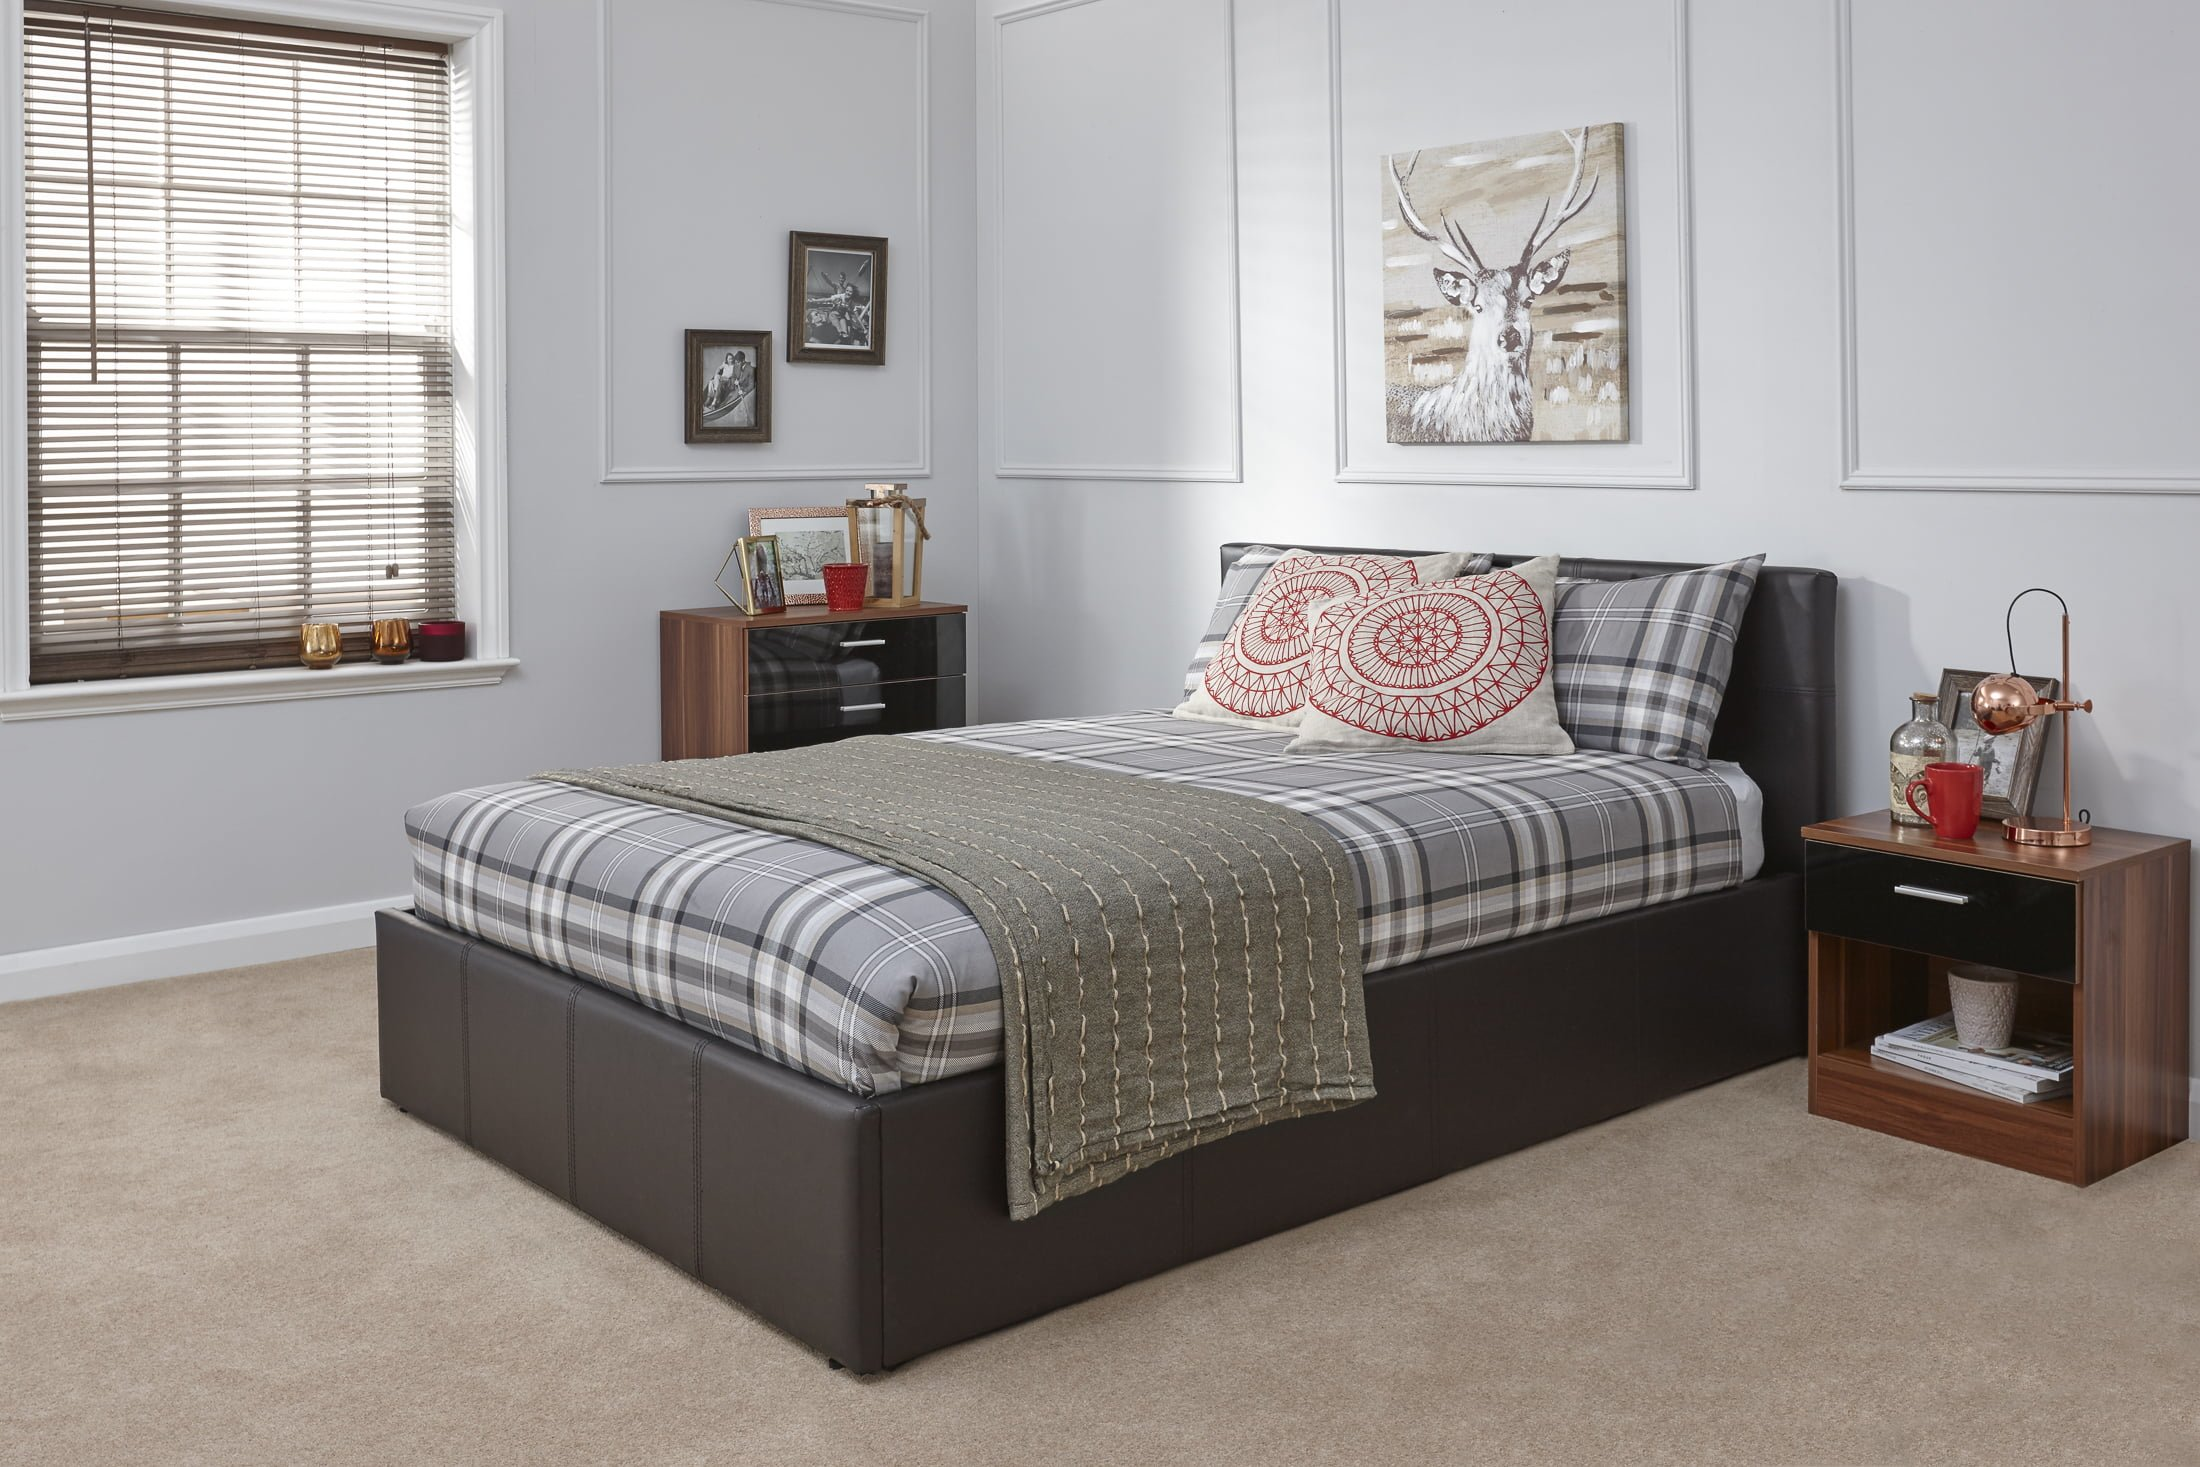 dublin beds